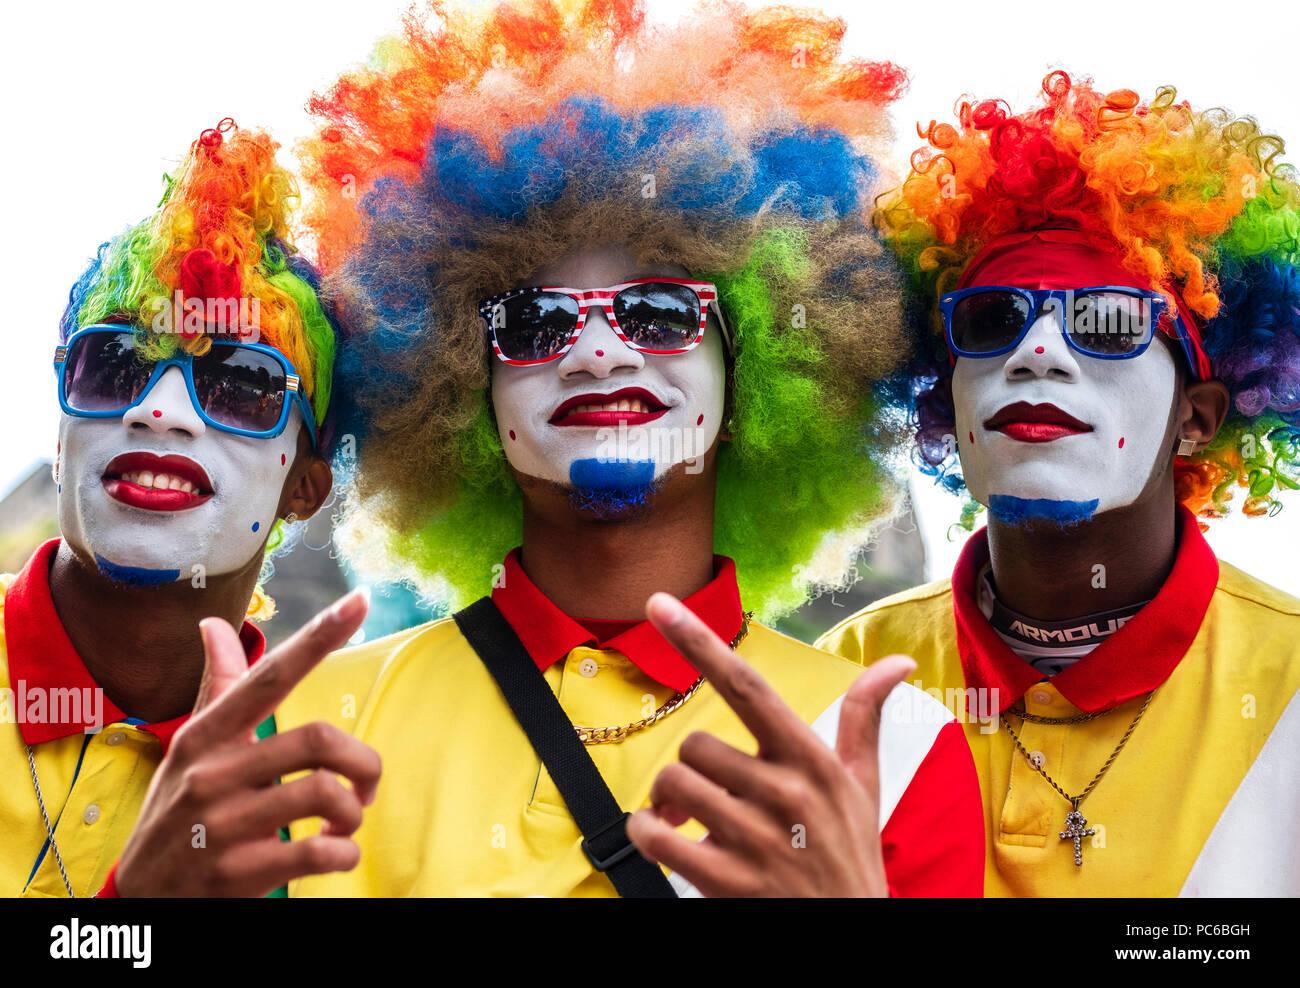 Edinburgh, Scotland, UK; 1 August, 2018. Fresh the Clownsss US internet hip hop dance sensations at opening day of Edinburgh Fringe Festival in Princes Street Gardens during photo call. Credit: Iain Masterton/Alamy Live News - Stock Image